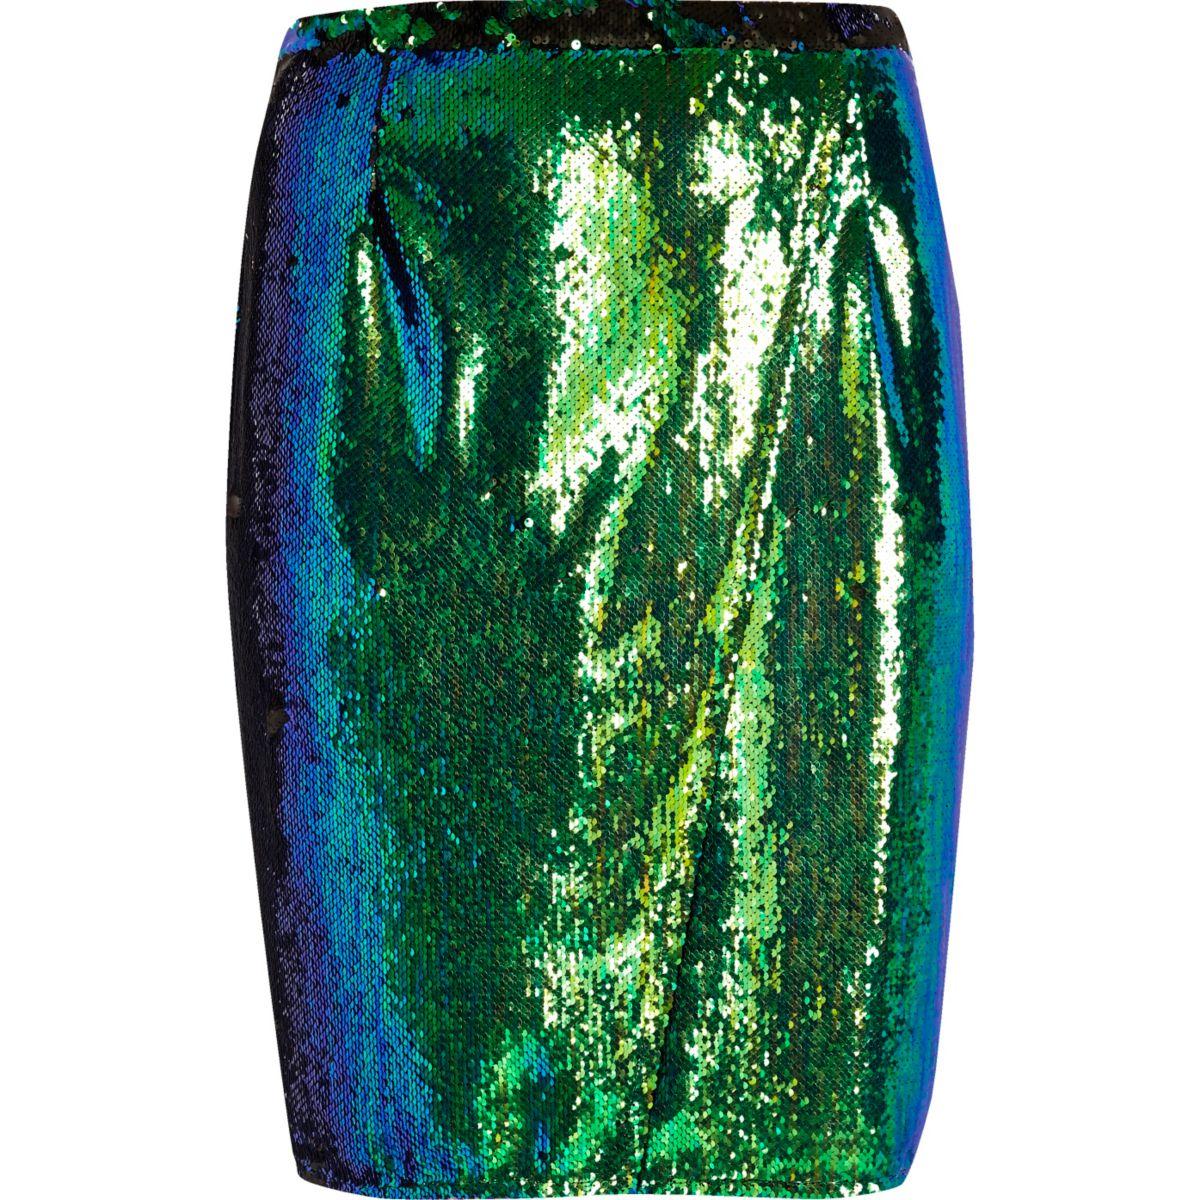 Jupe crayon Plus vert émeraude à sequins